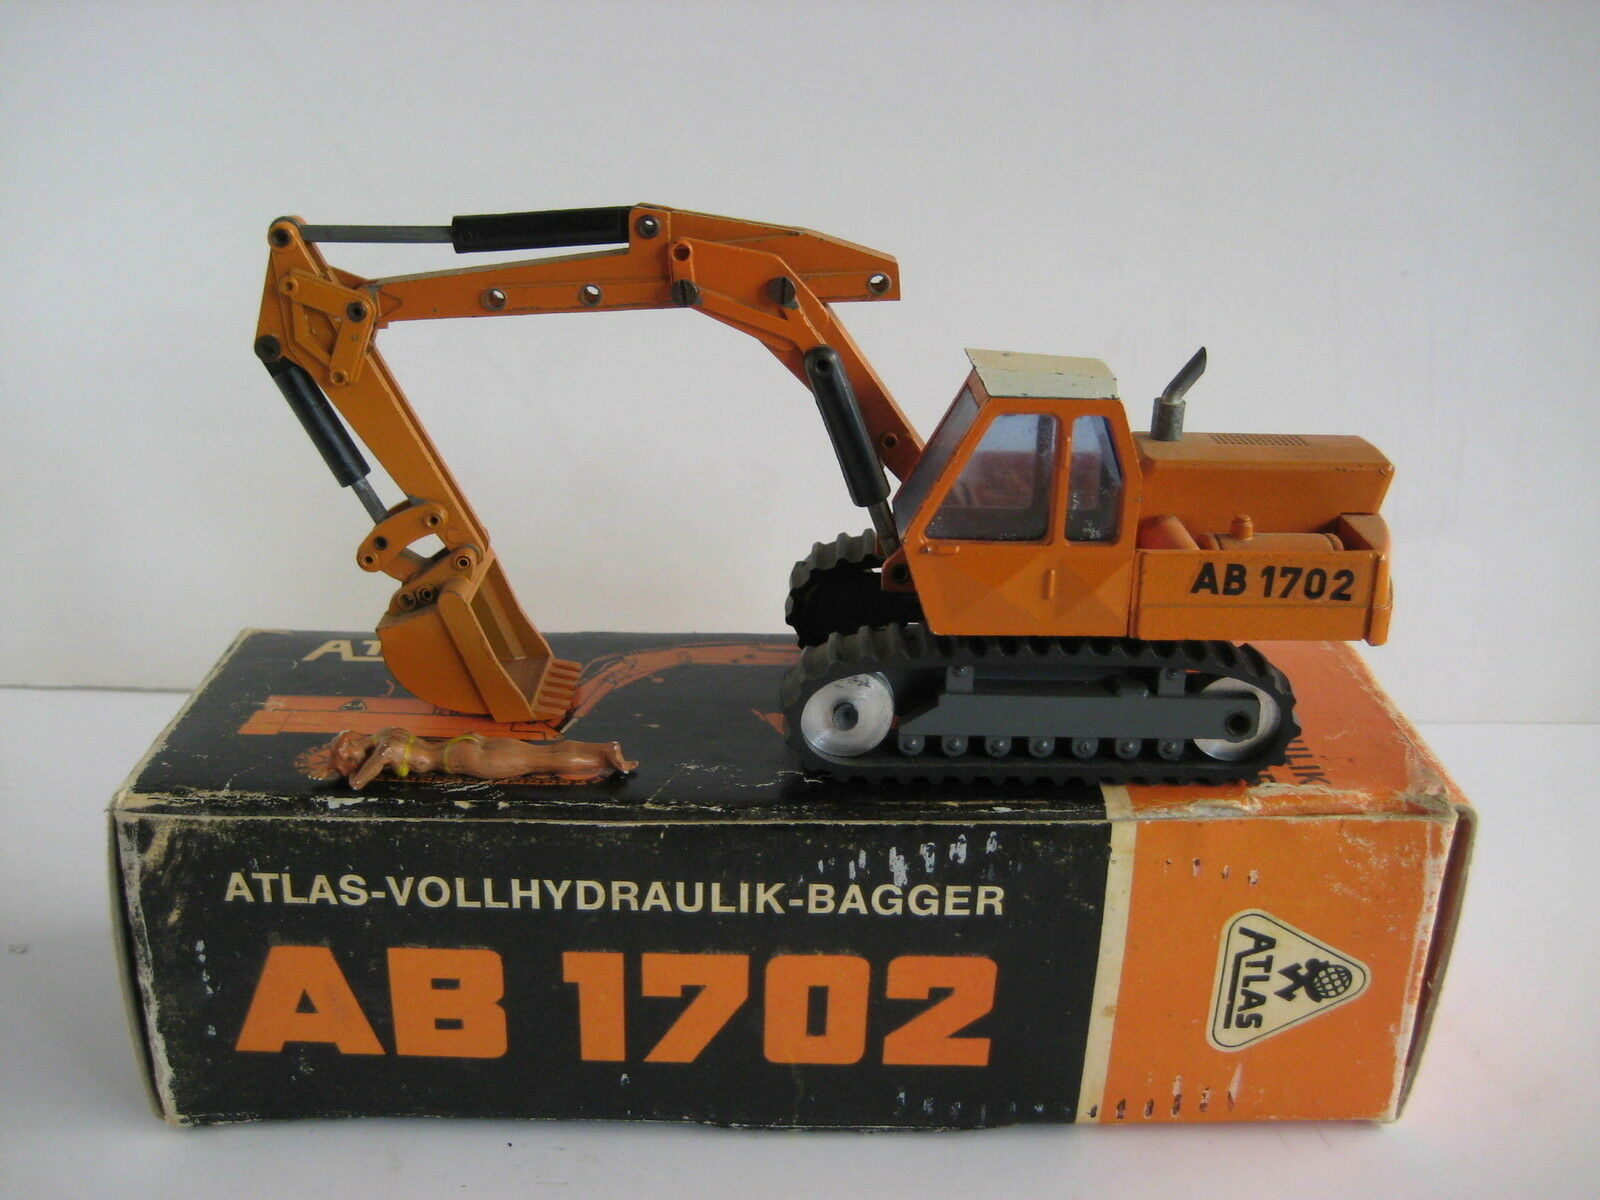 Atlas ab 1702 excavator shovel  104.3 nzg 1 50 original packaging